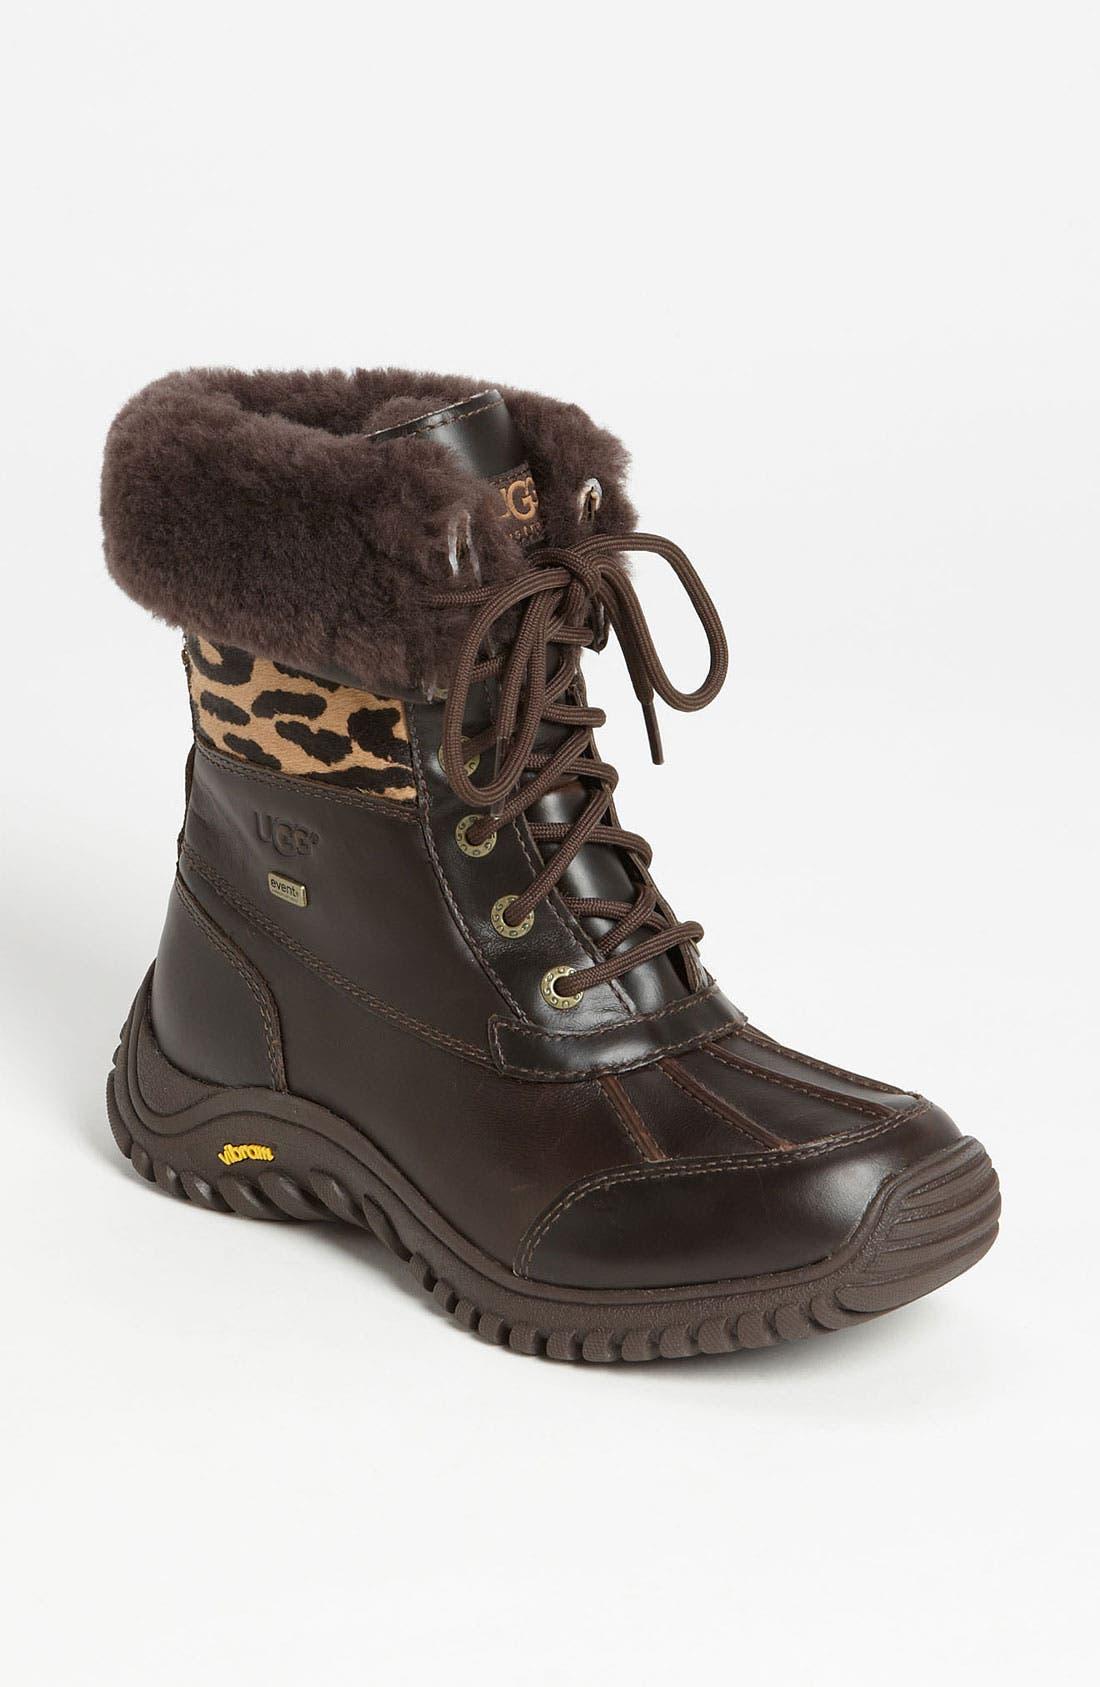 Alternate Image 1 Selected - UGG® Australia 'Adirondack Exotic' Boot (Women)